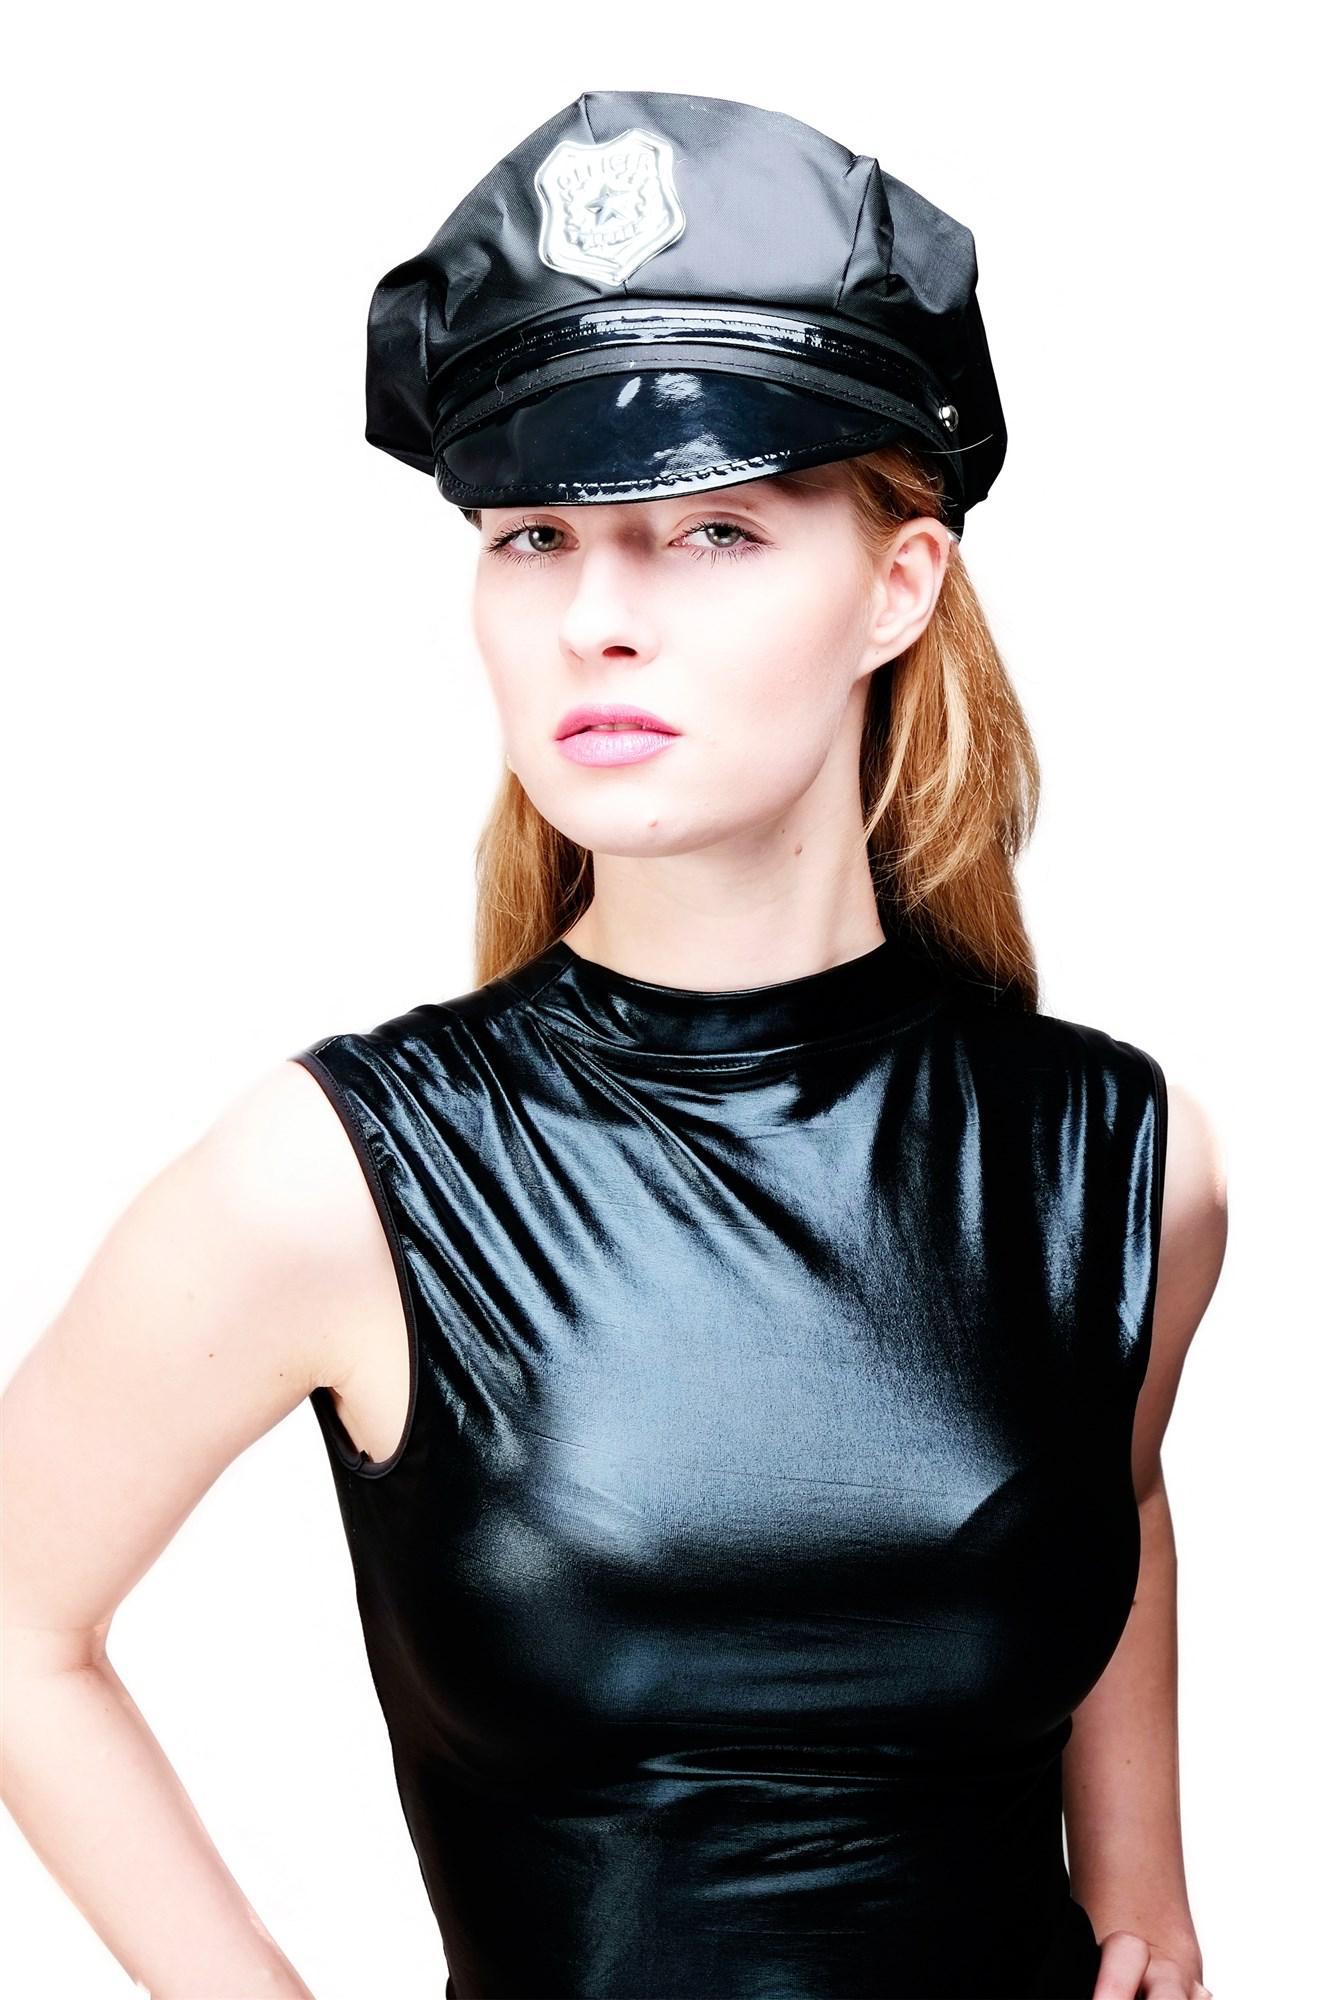 Amerik Polizist